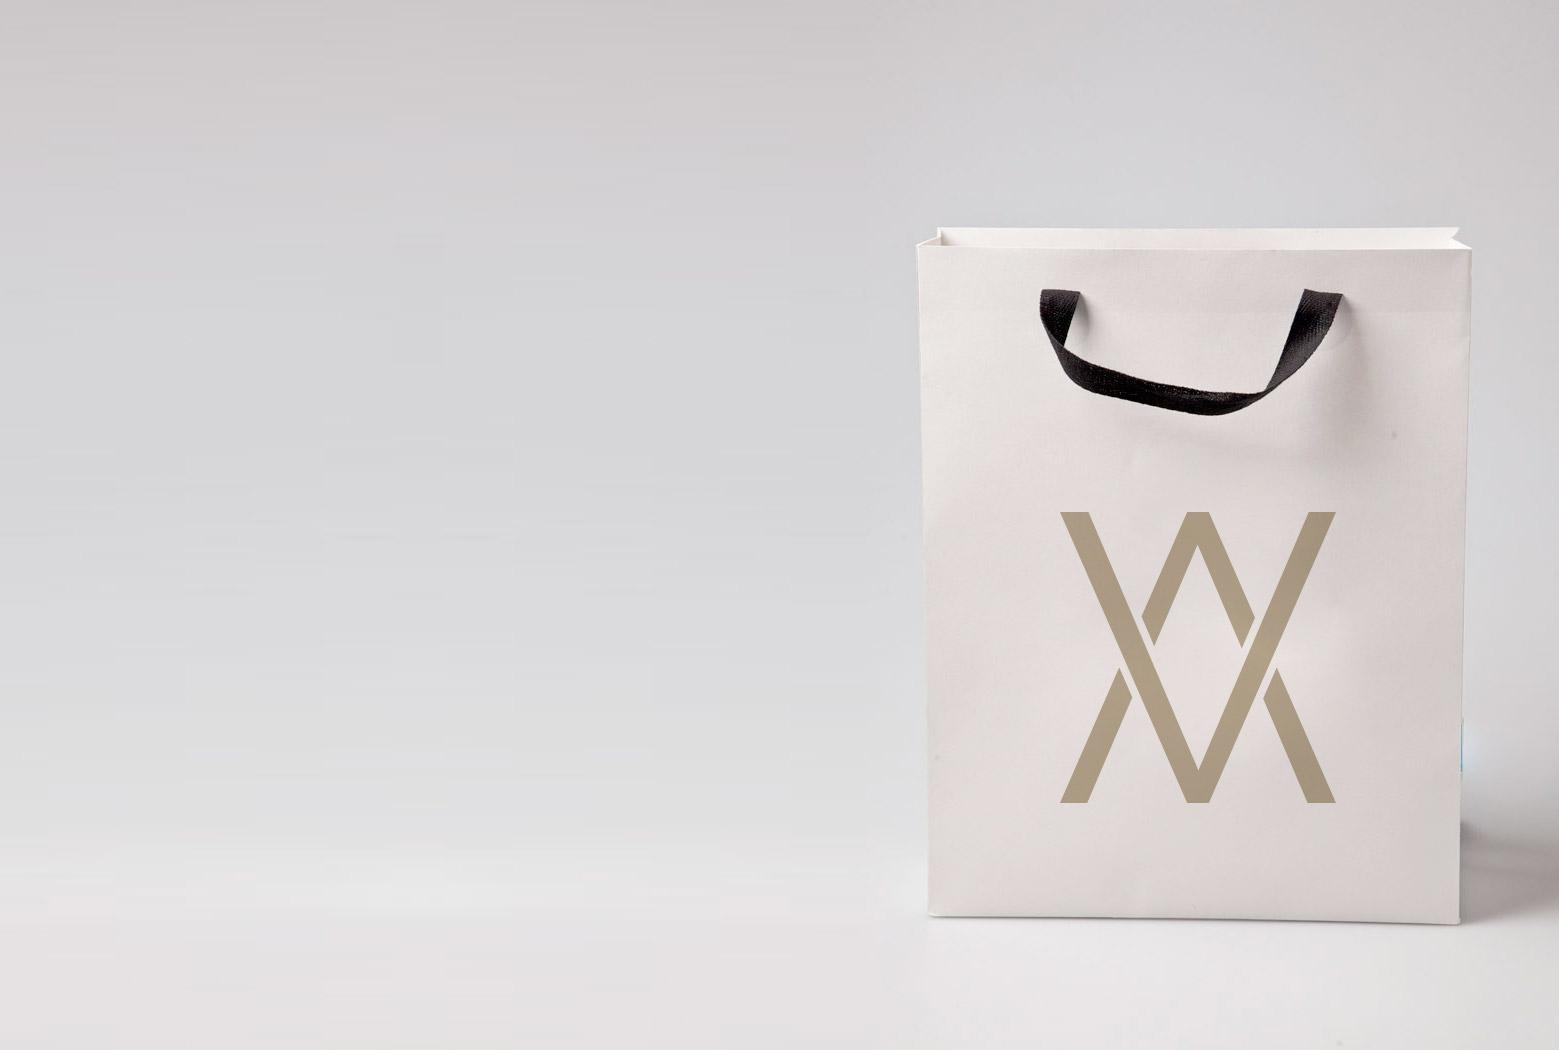 Vezavena-Bag